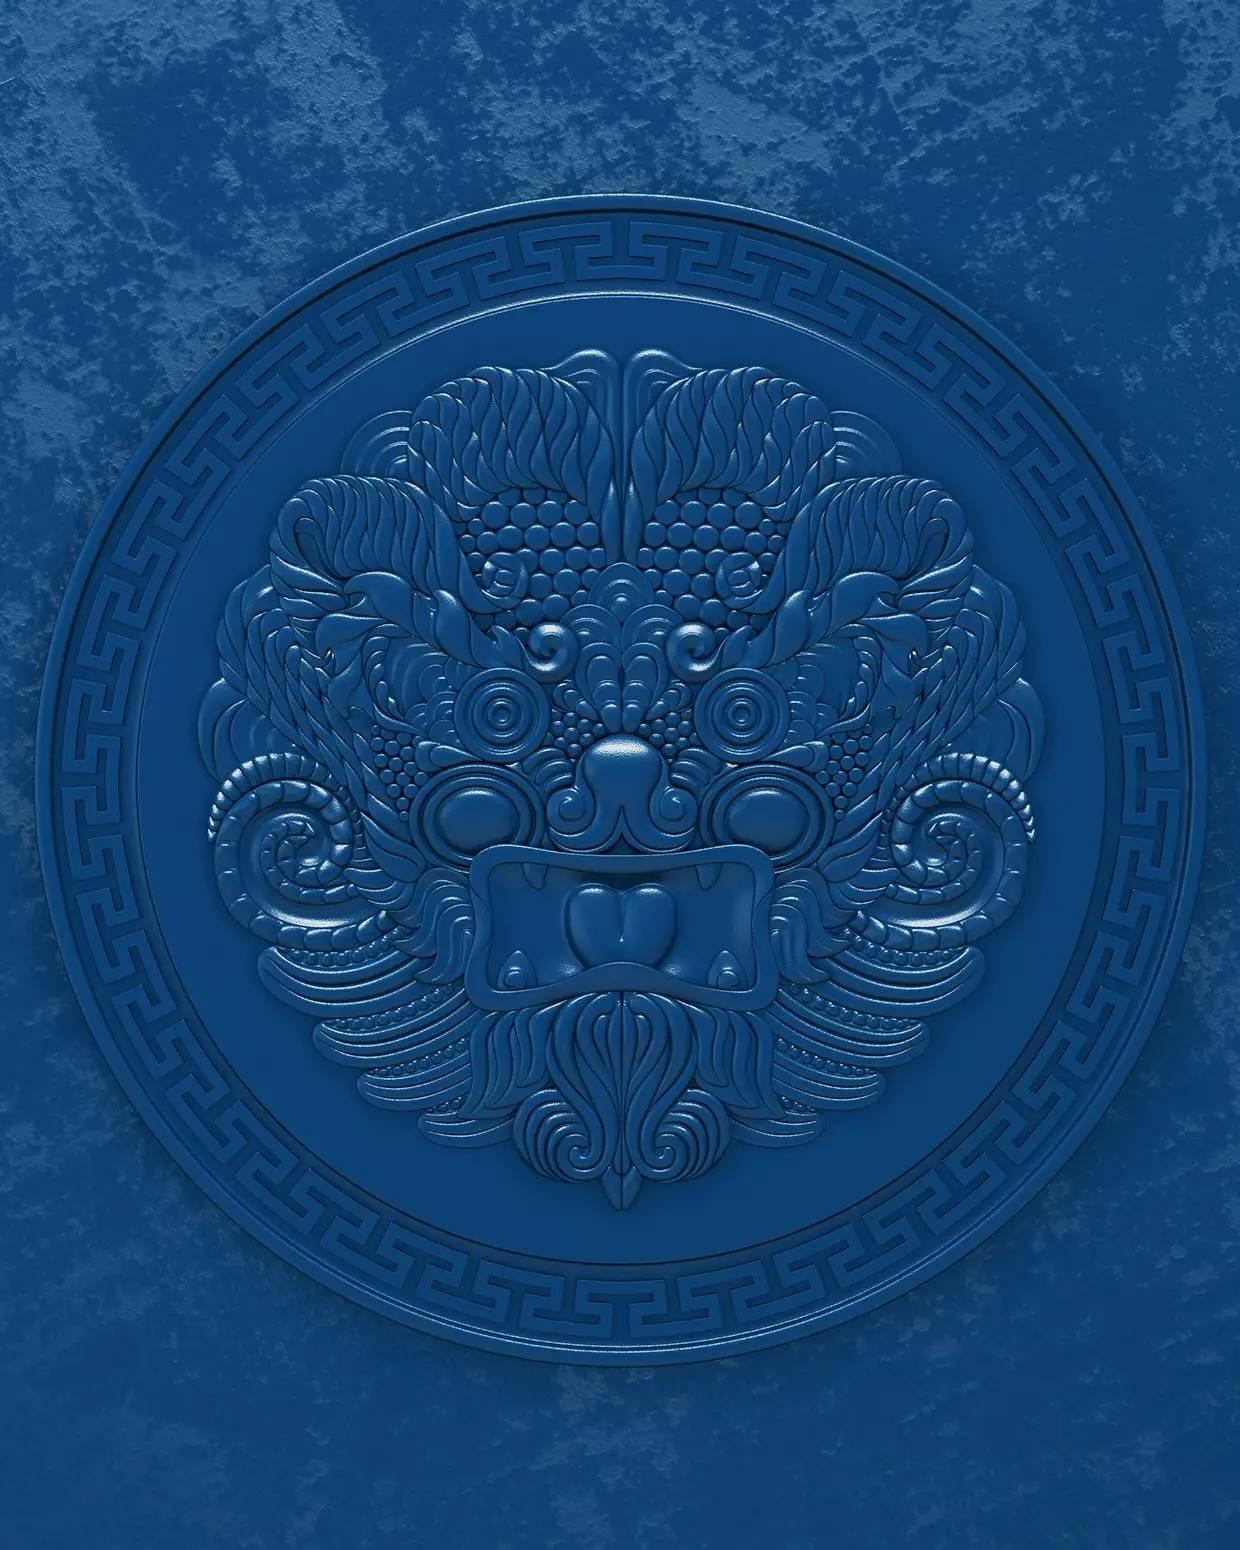 室内设计|蒙族传统装饰(Mongolian Traditional Ornament) 第12张